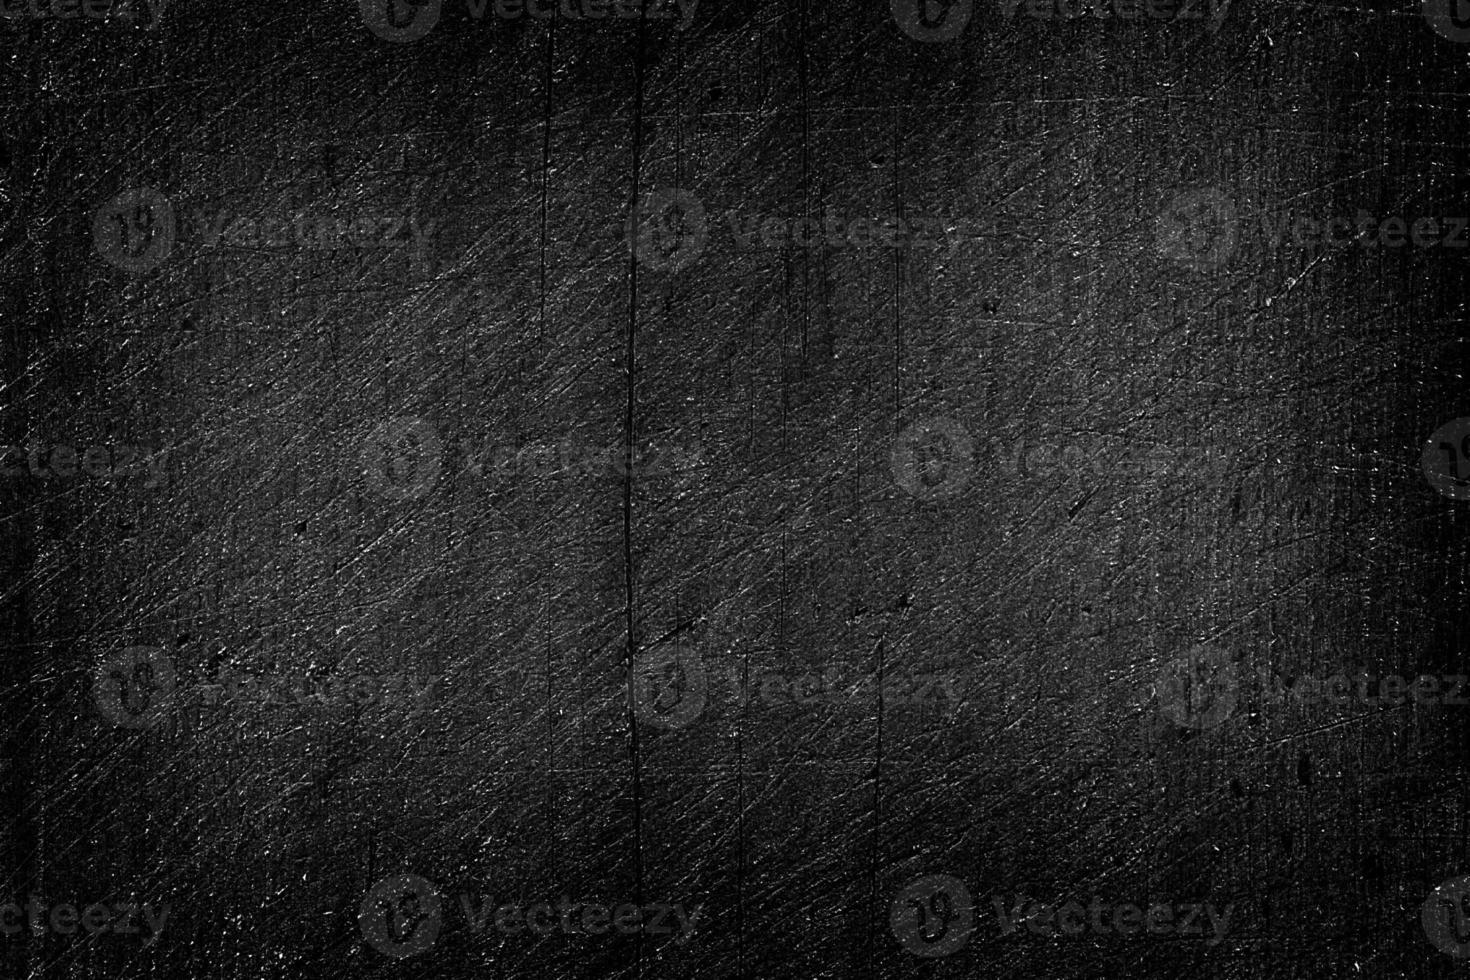 textura de madera negra foto